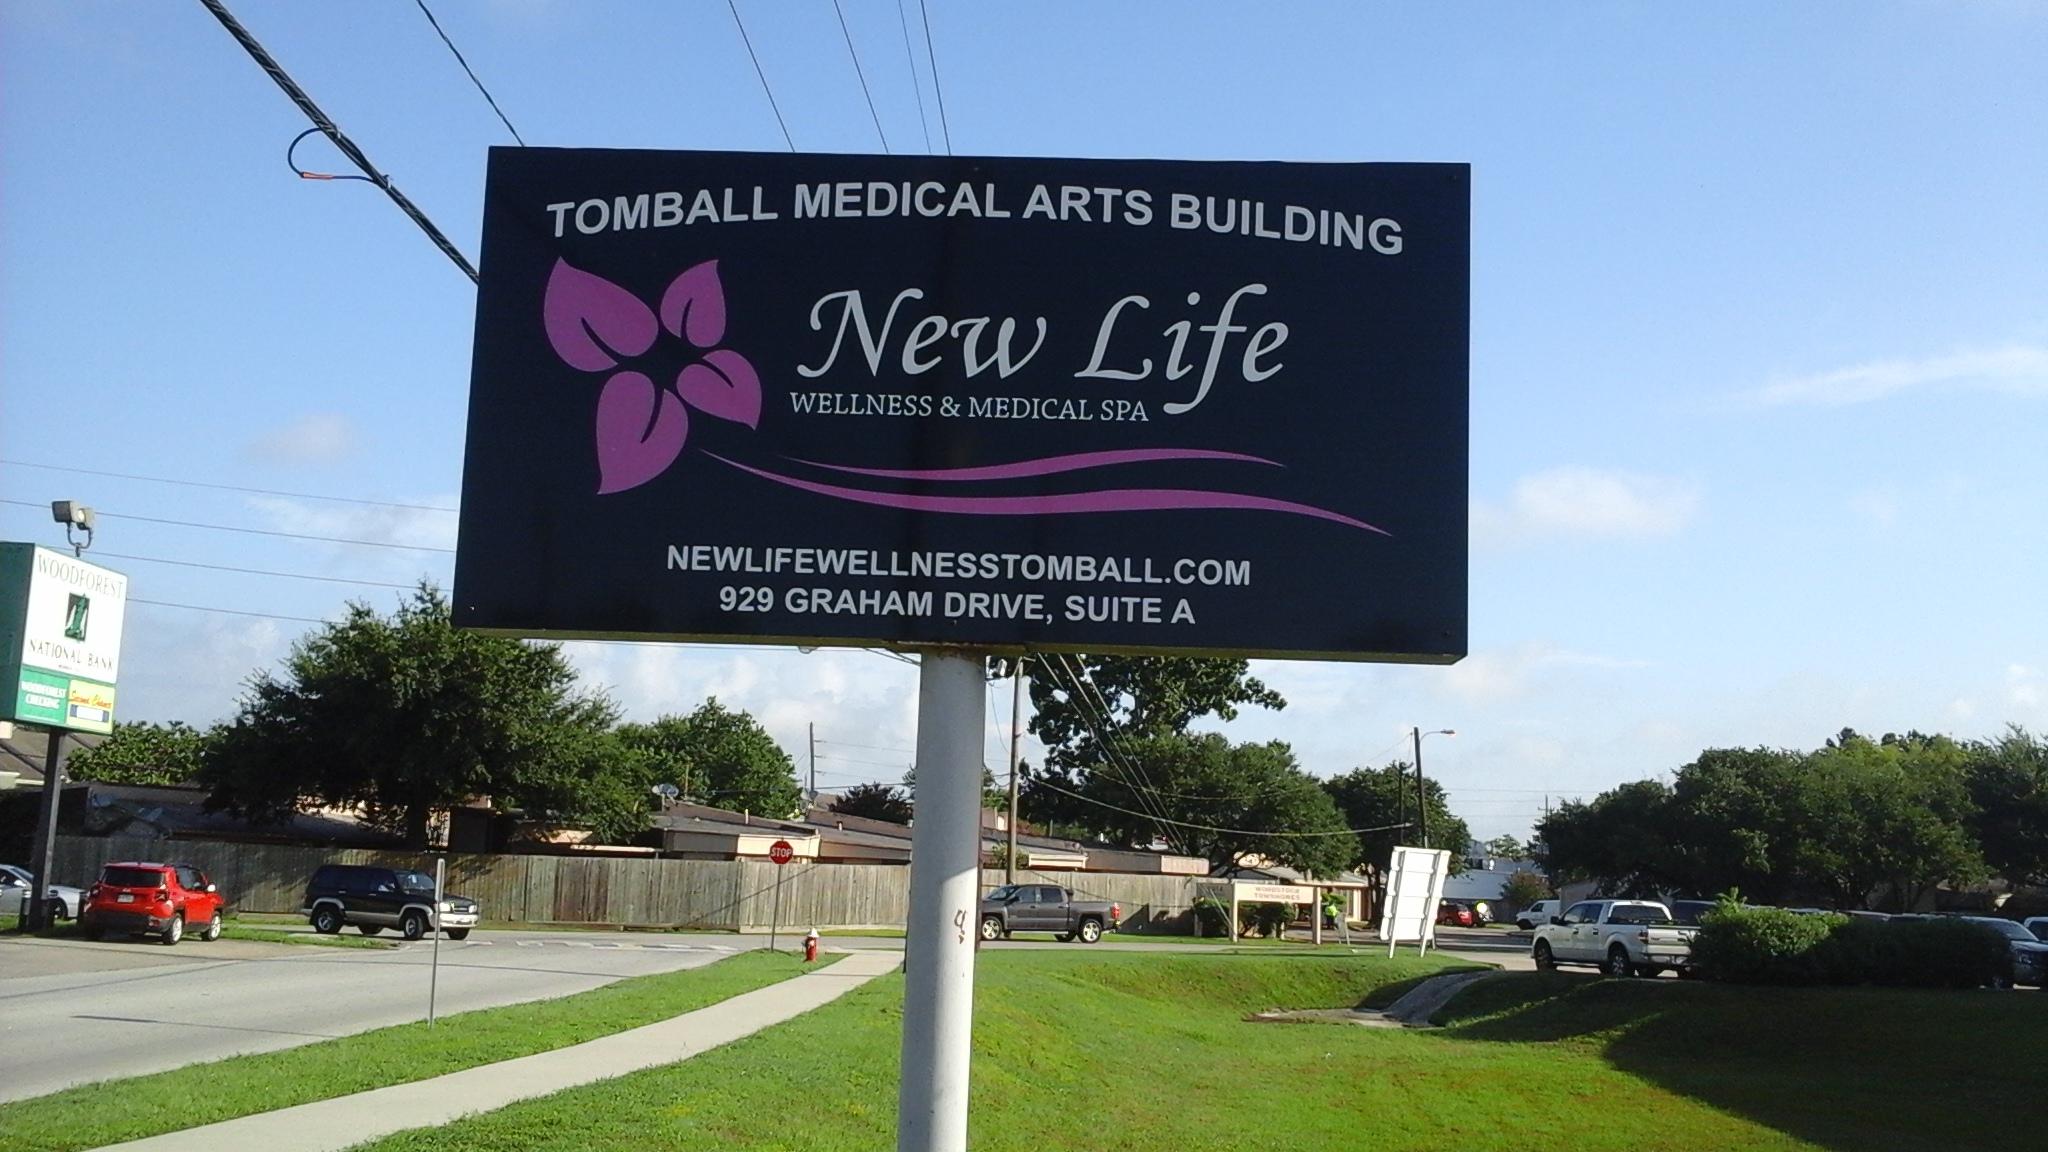 New Life Wellness and Medical Spa image 2